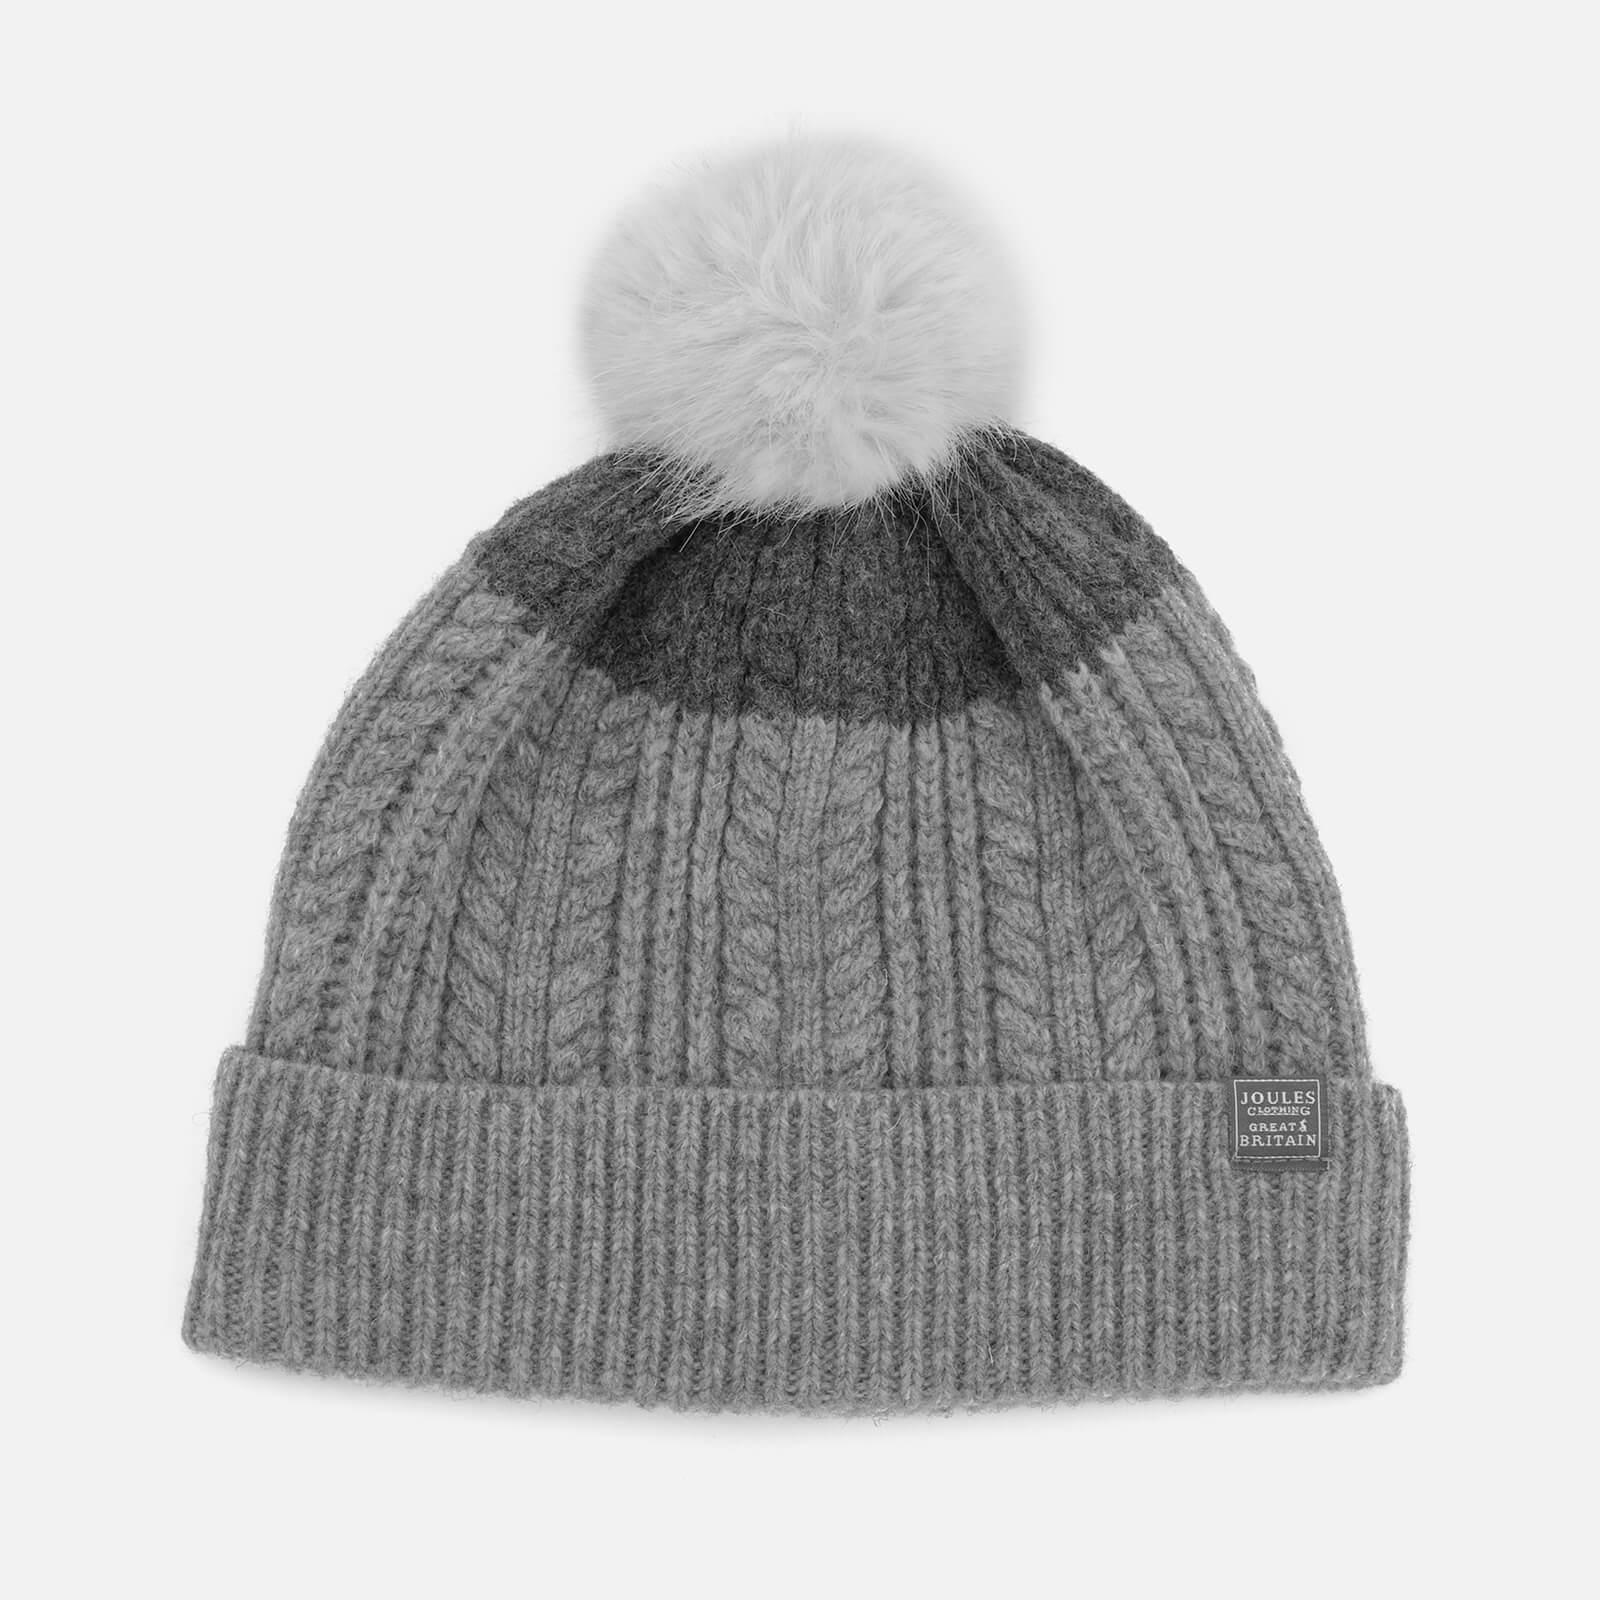 ca37b9147 Joules Women's Fine Cable Bobble Hat with Faux Fur Pom - Light Grey